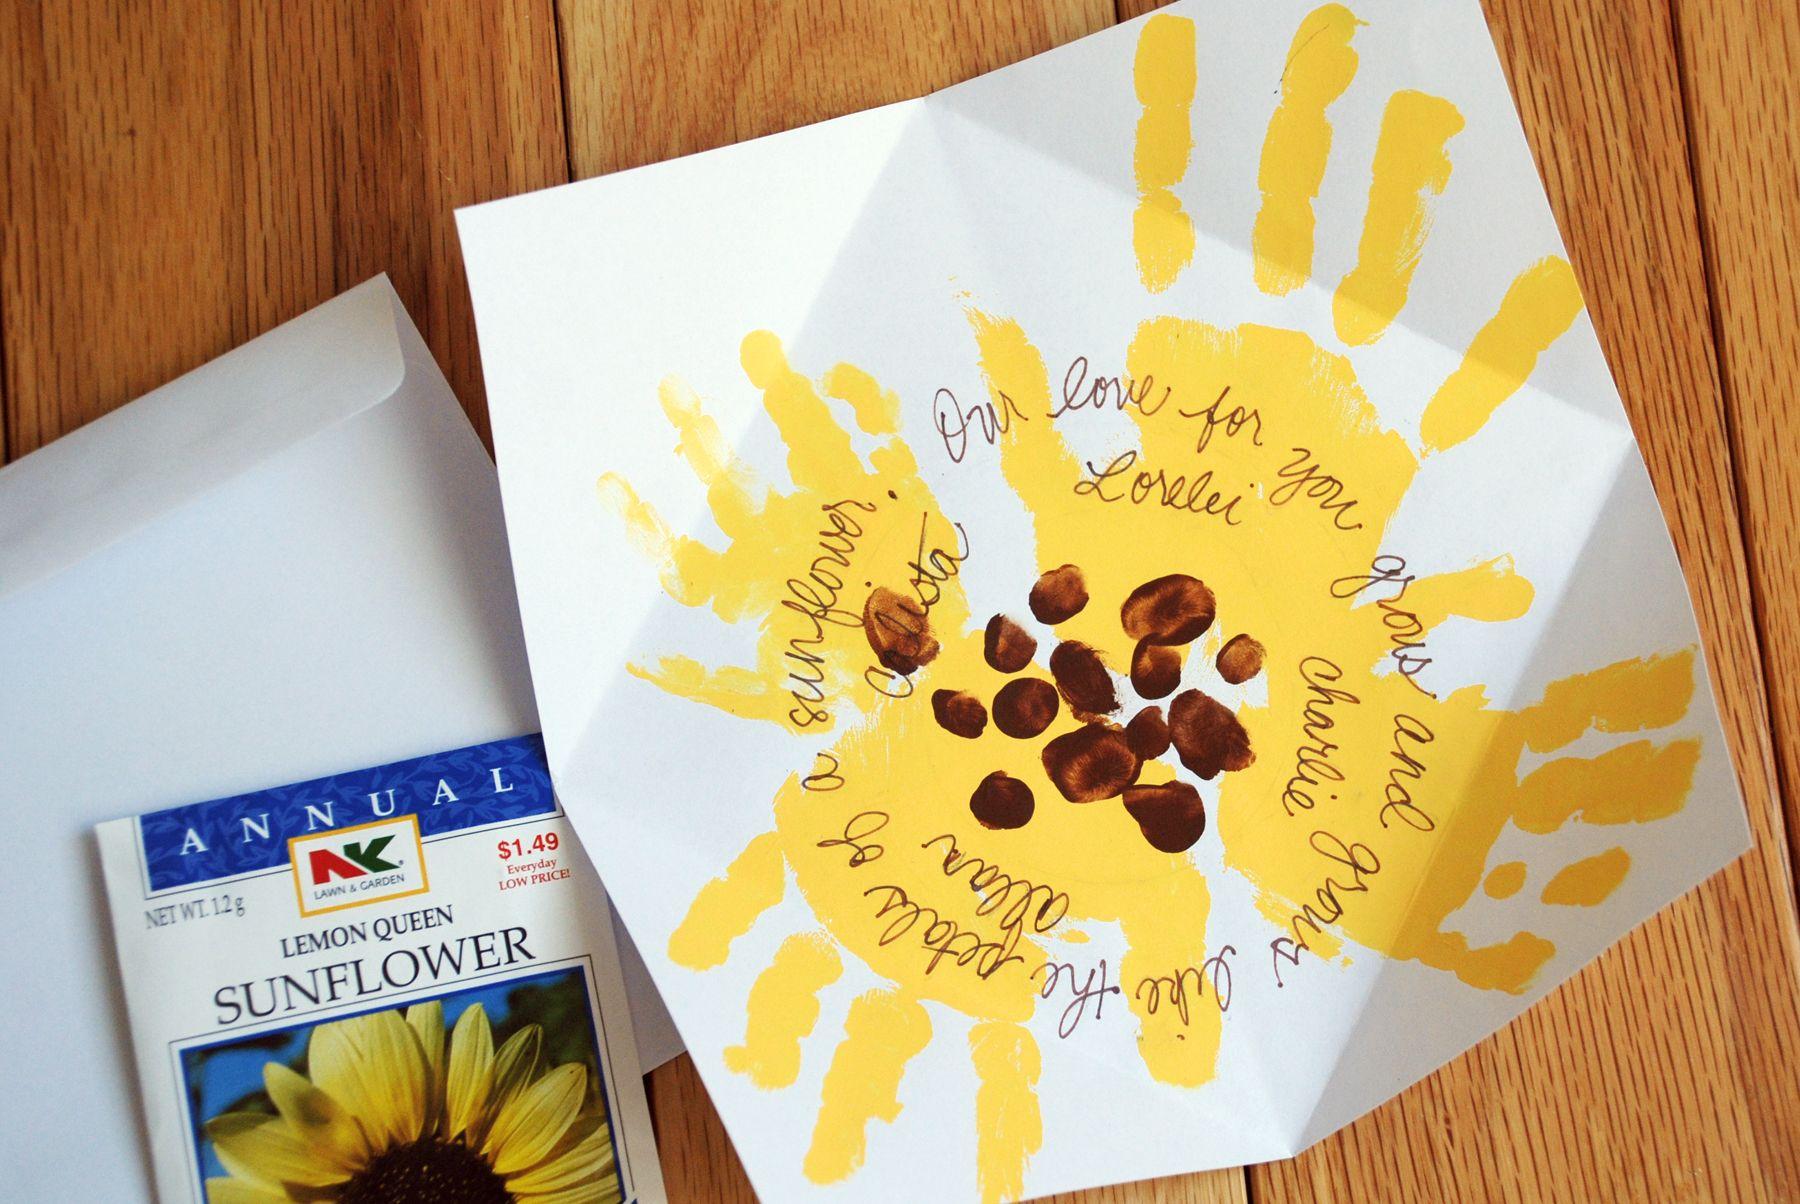 Mothers Day Cards Ideas For Children To Make Part - 28: Church Crafts Children | ... Motheru0027s Day Sunflower Handprint Card | Alanna  George |